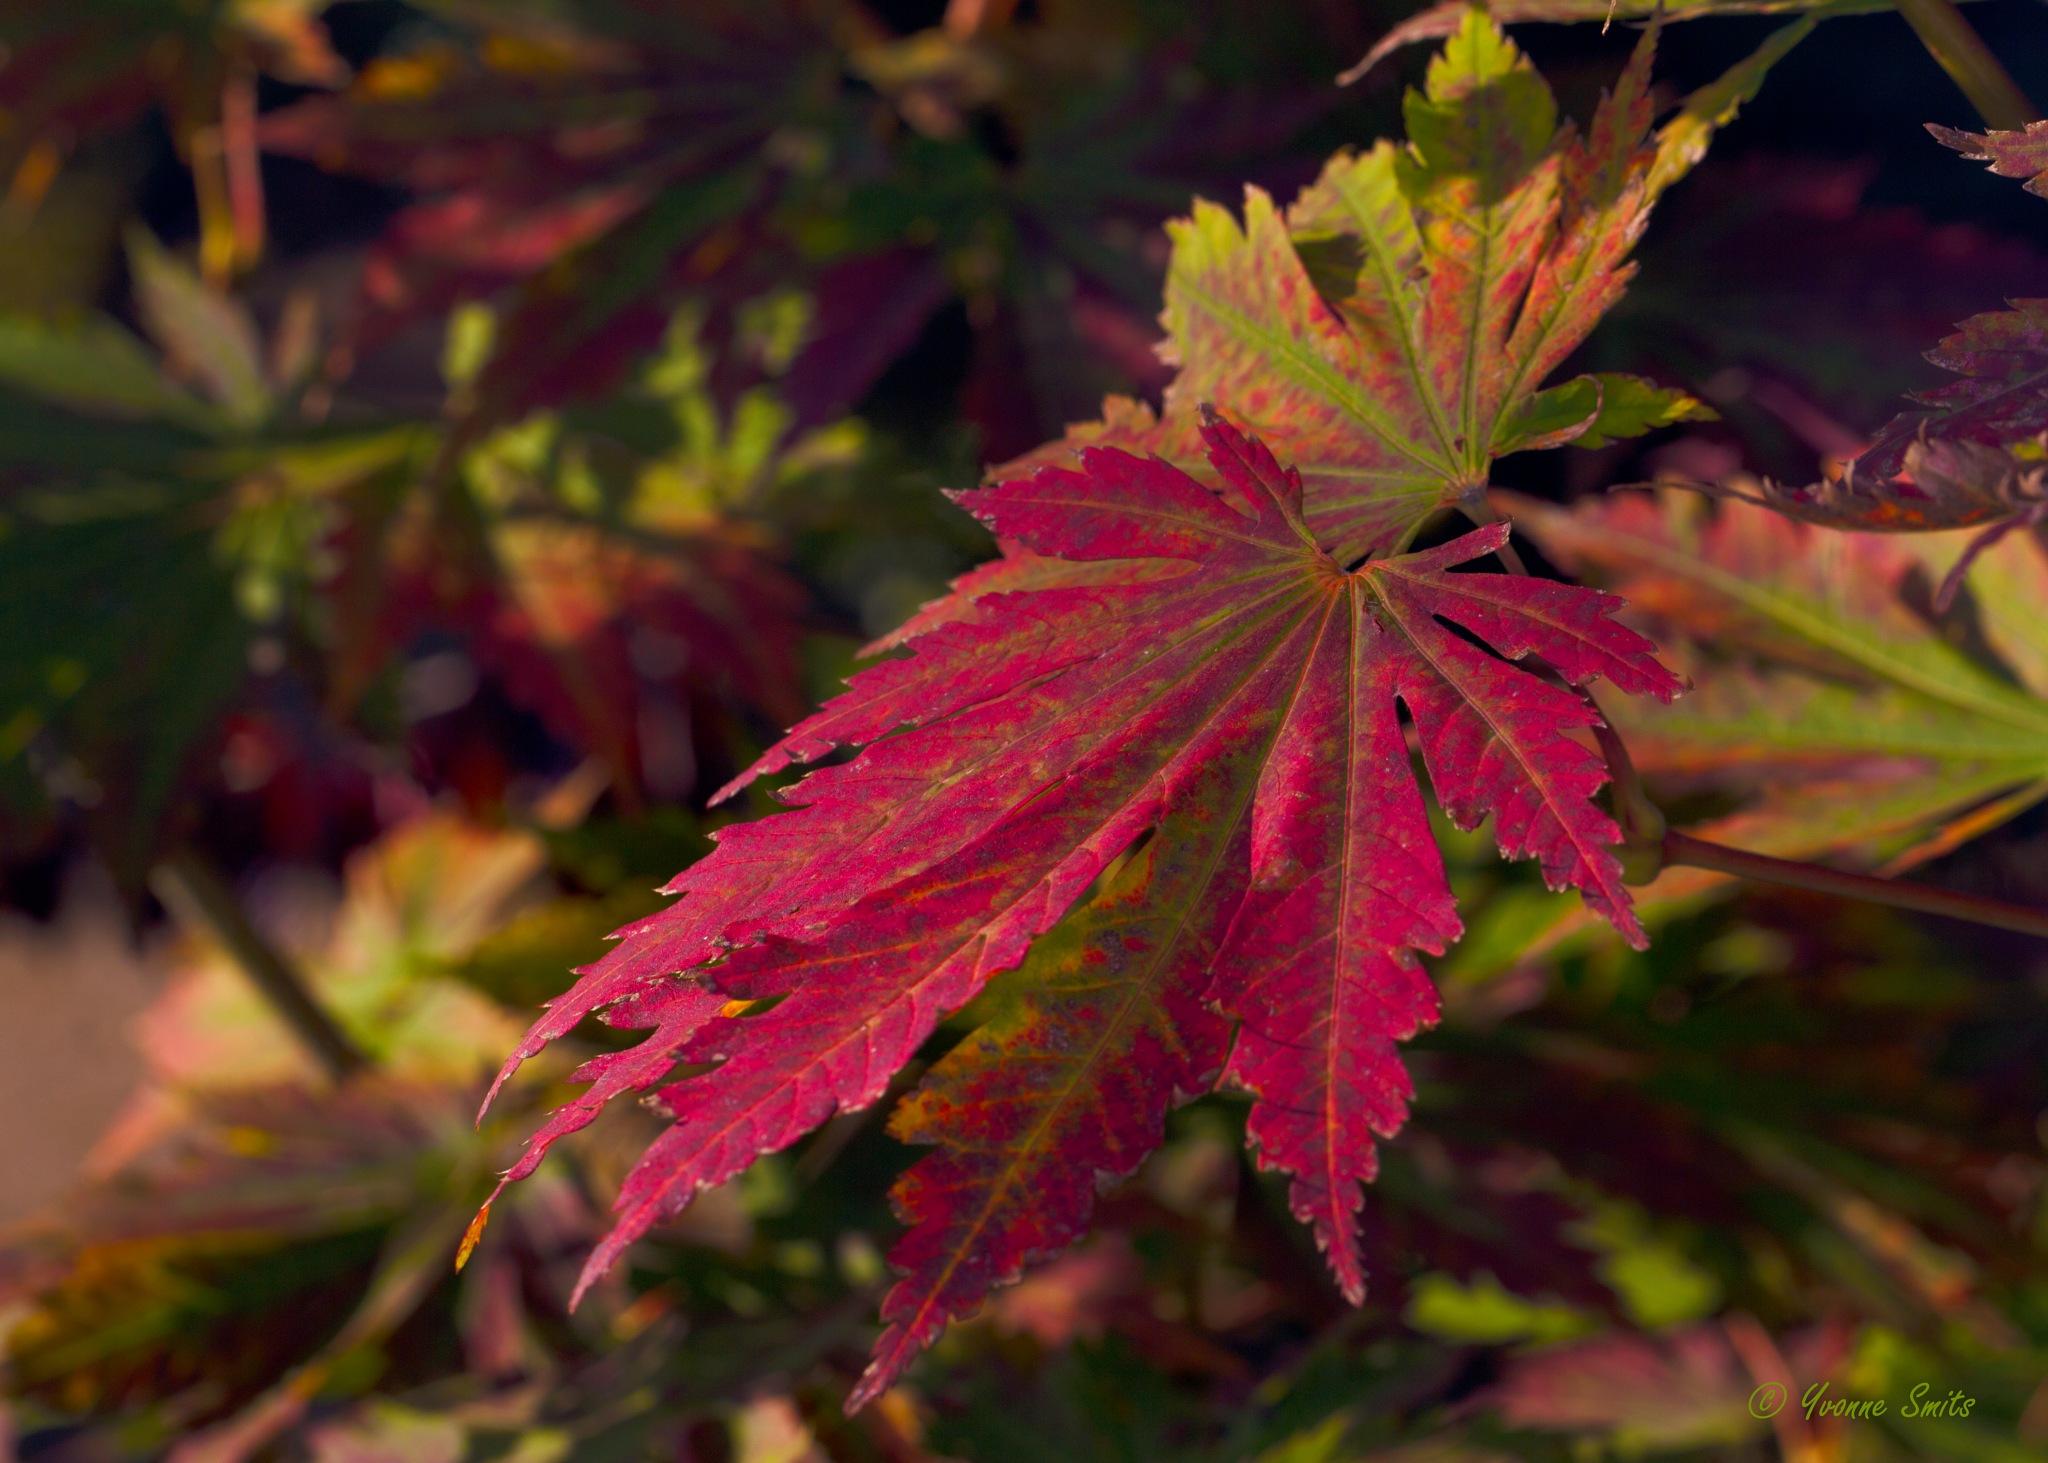 Colorful leaf by Yvonne Smits